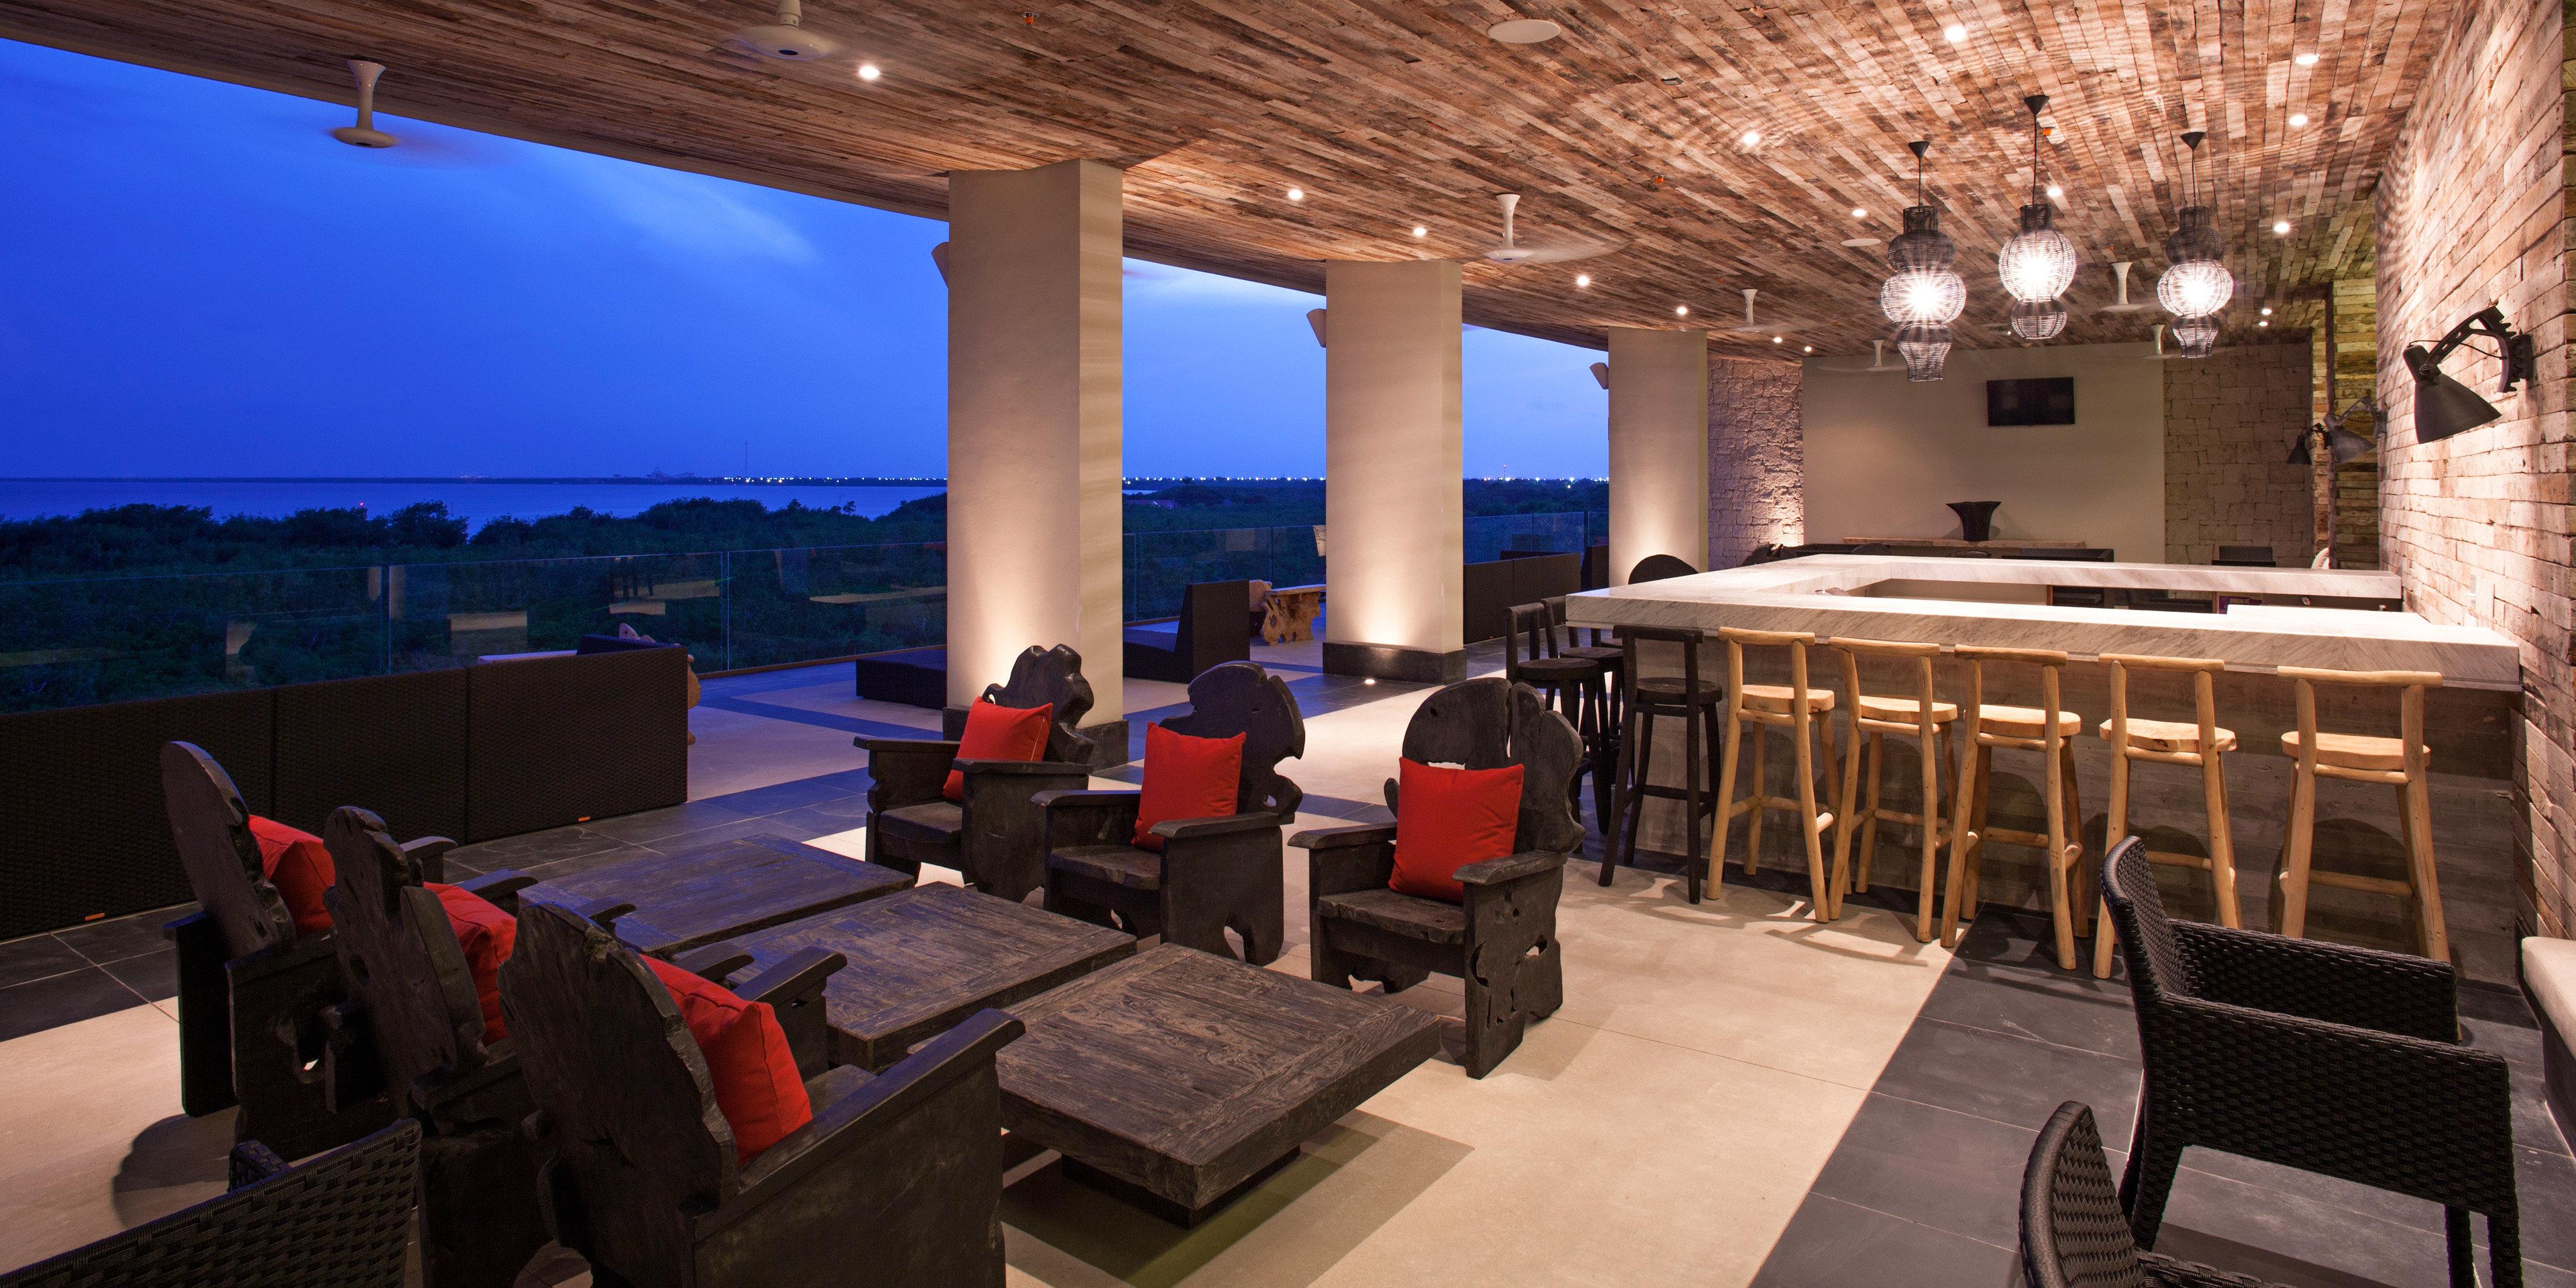 Bar Dining Romance chair restaurant